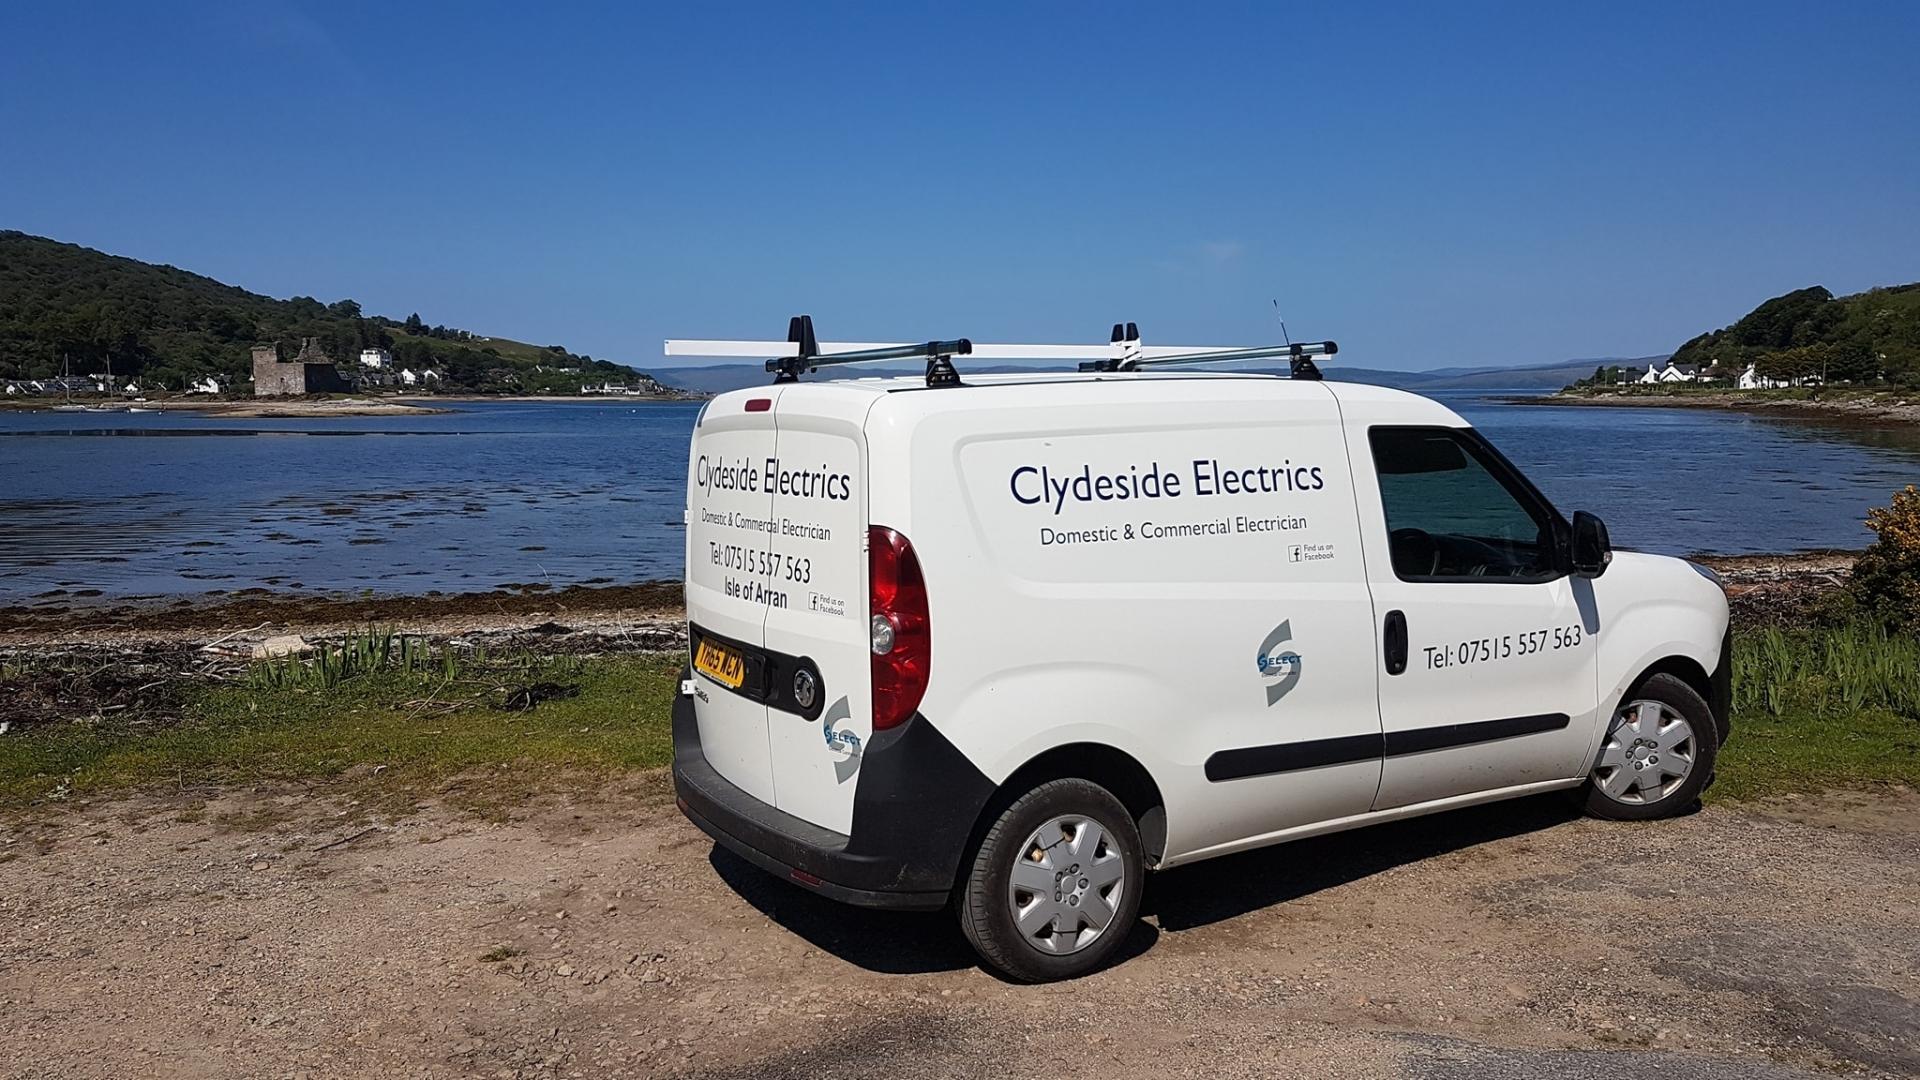 Clydeside Electrics